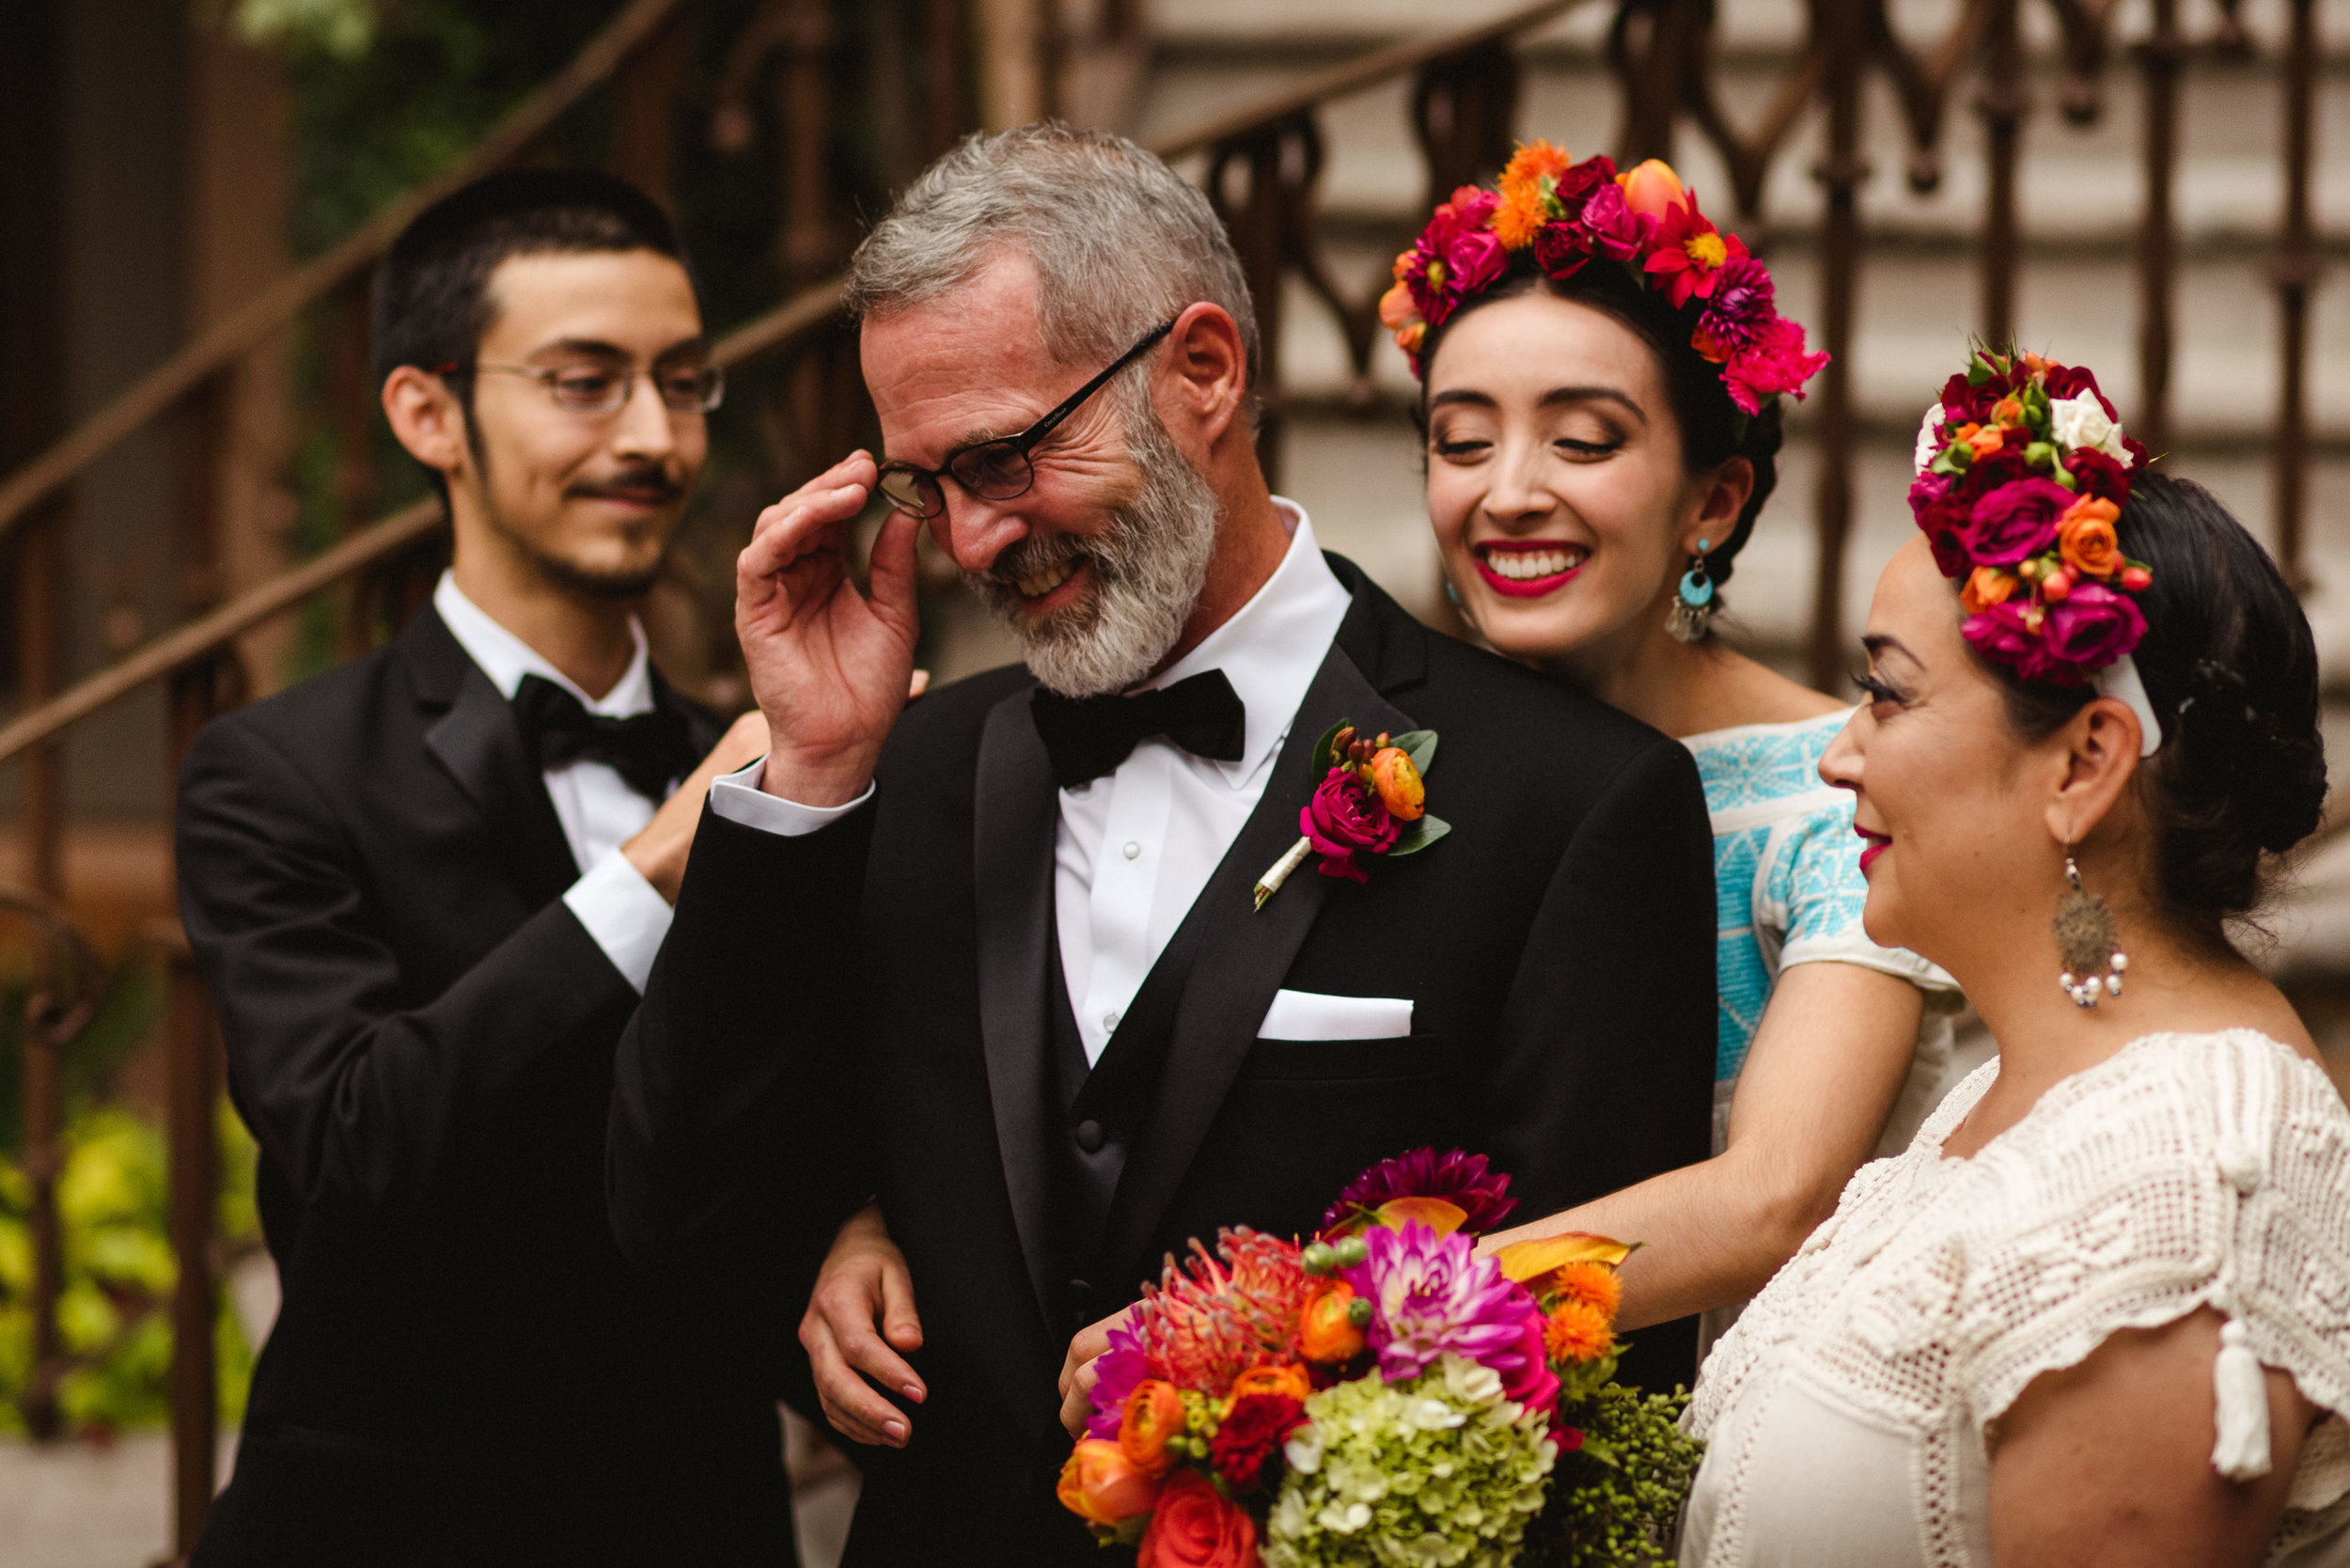 MaurizioSolisBroca-casa-carino-san-miguel-de-allende-wedding-41.jpg